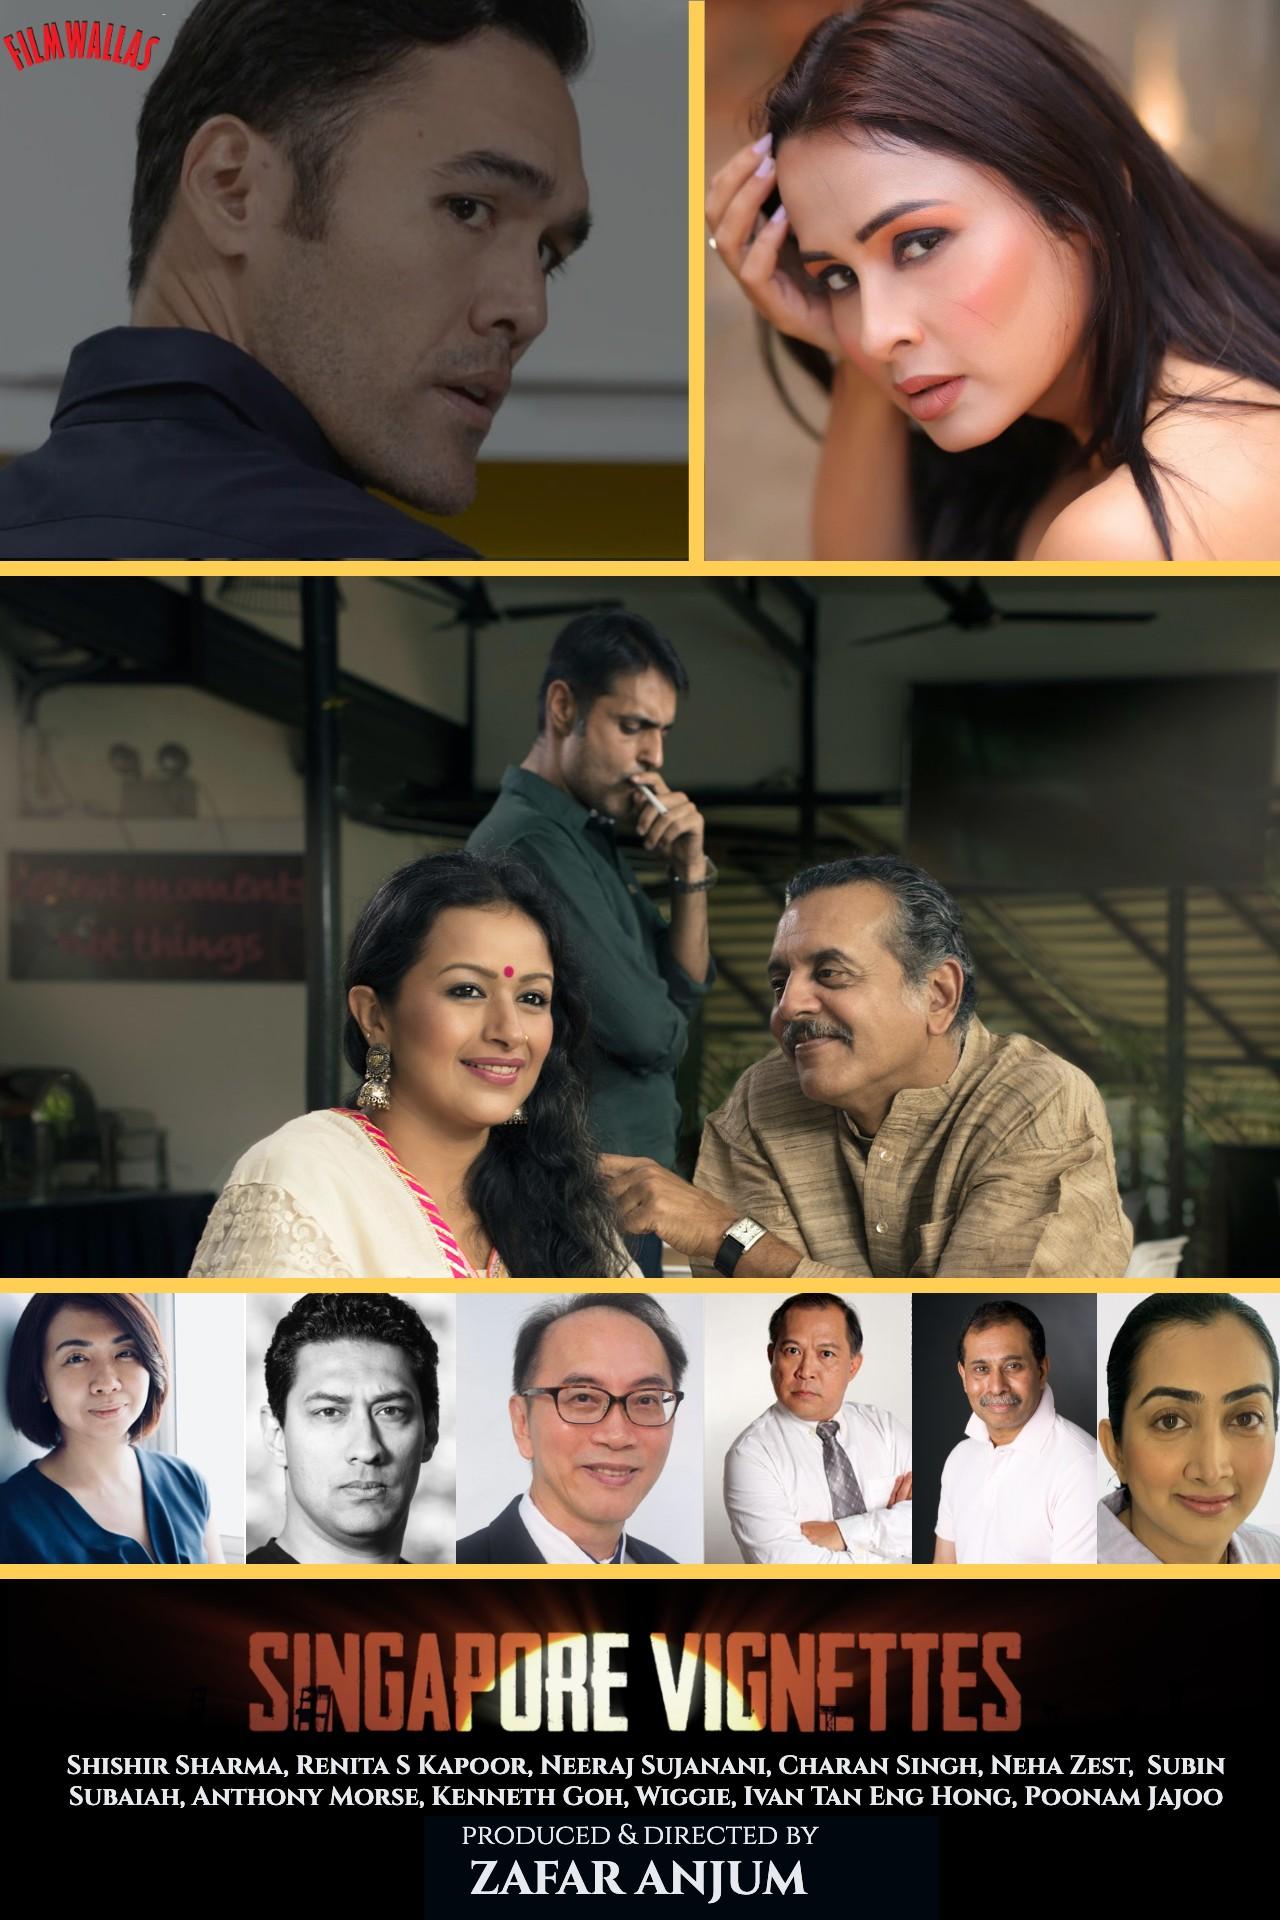 Singapore Vignettes (2021) Hindi 720p HDRip x264 AAC 350MB Download